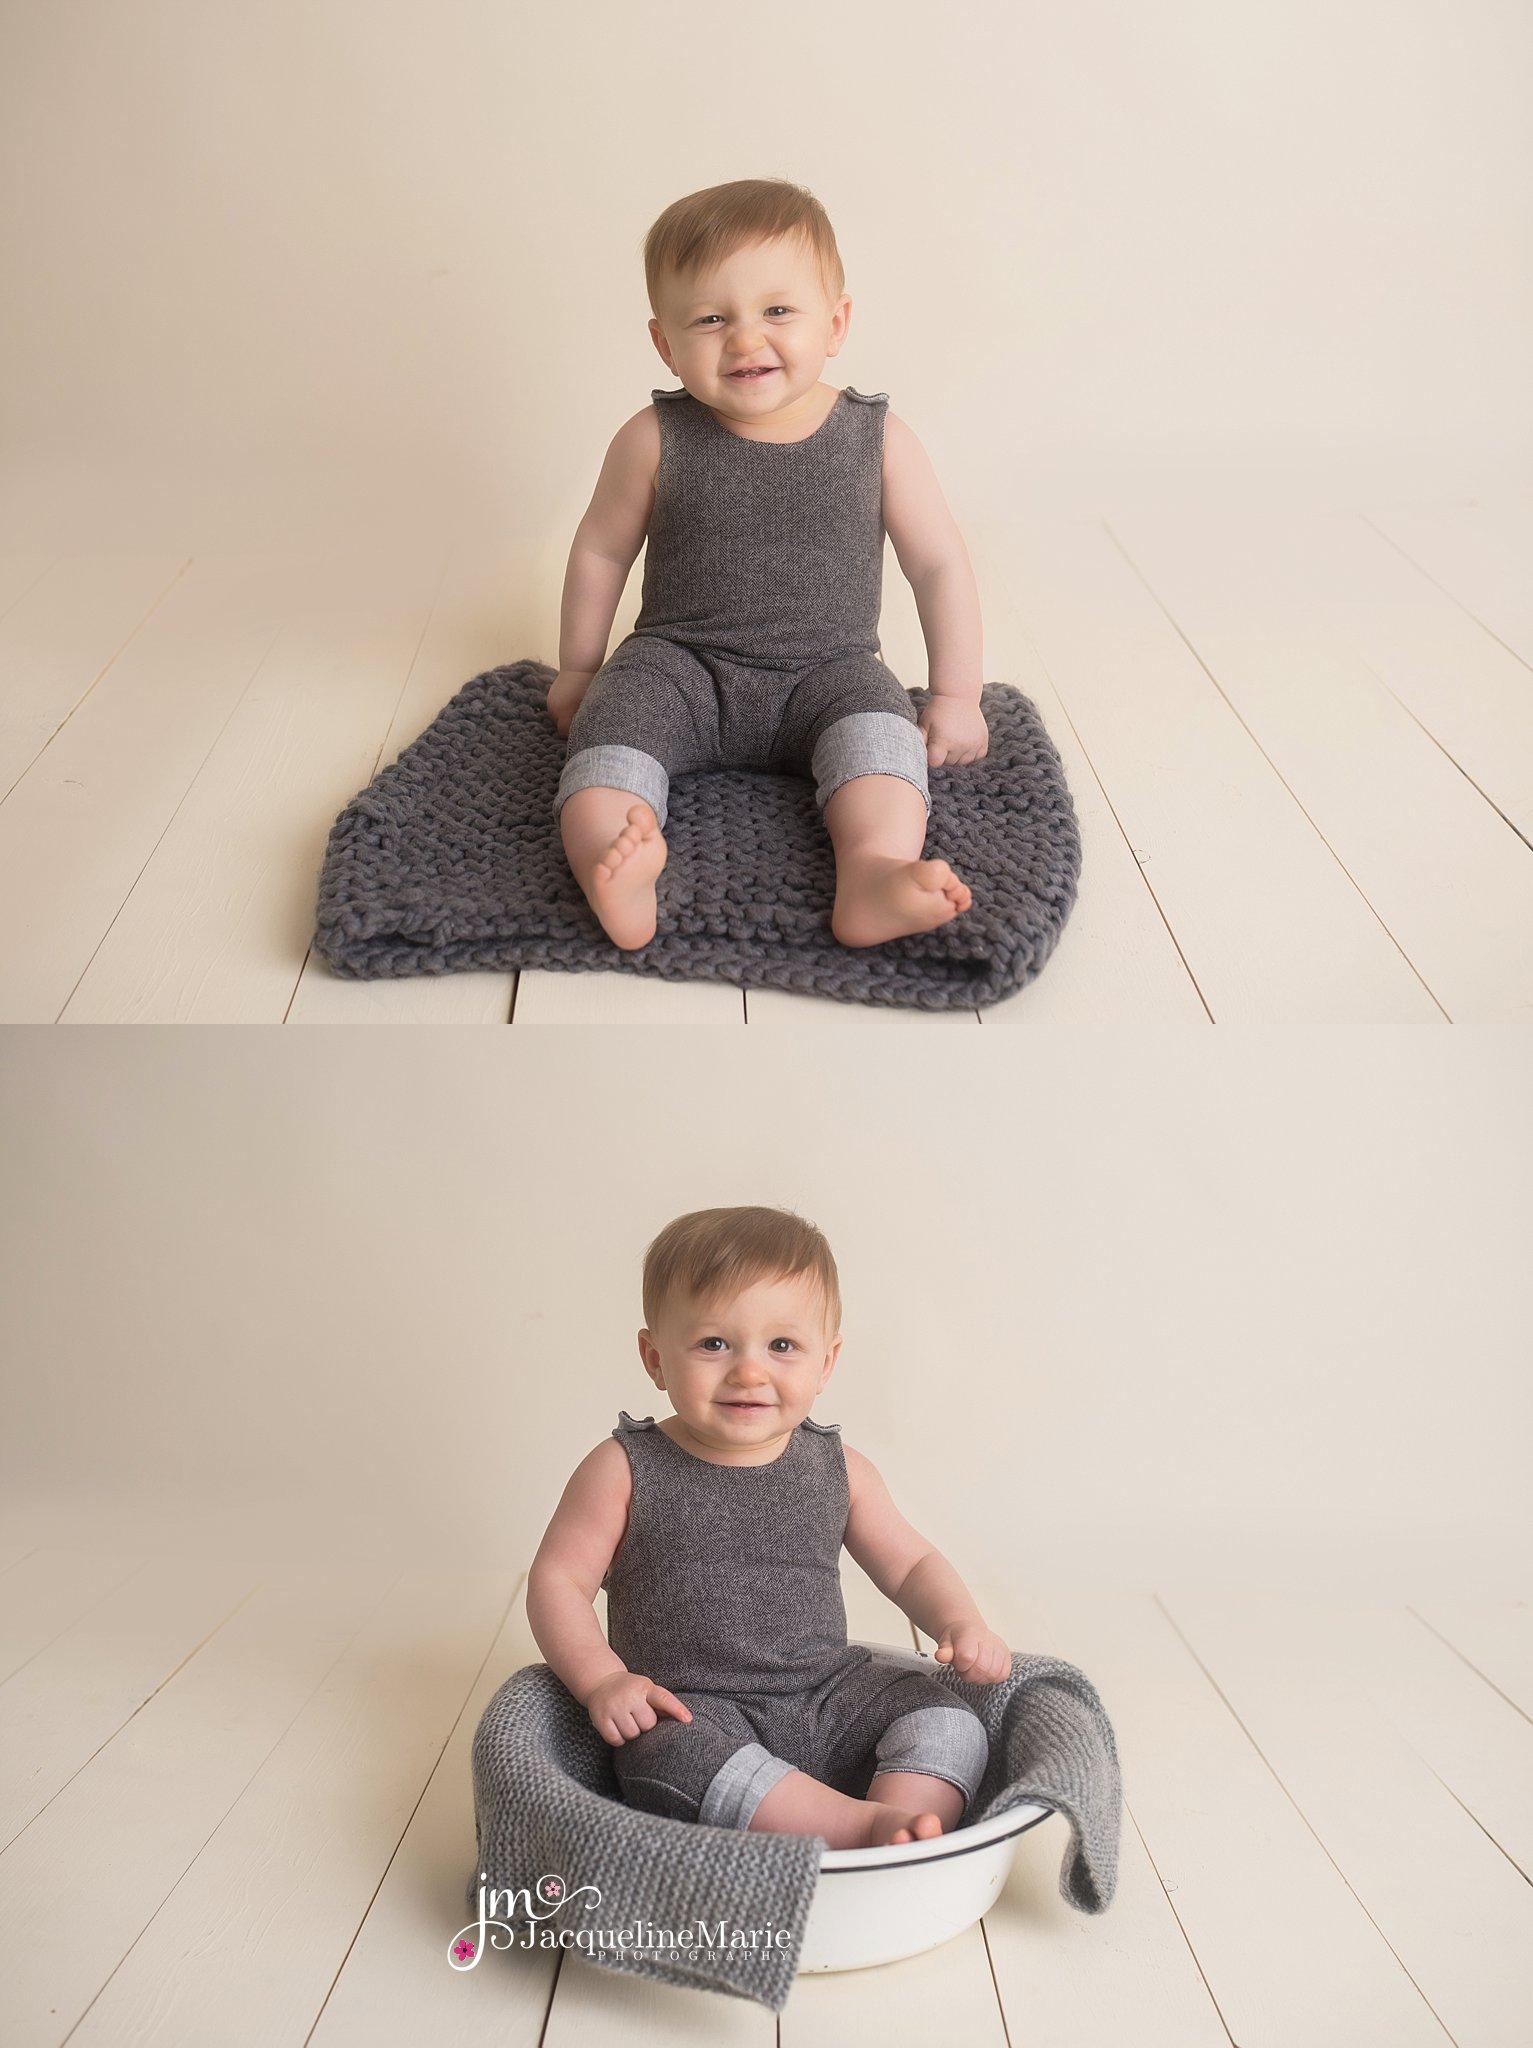 Pataskala Ohio photographer | baby boy photography | Columbus Ohio baby photographer | baby boy photography